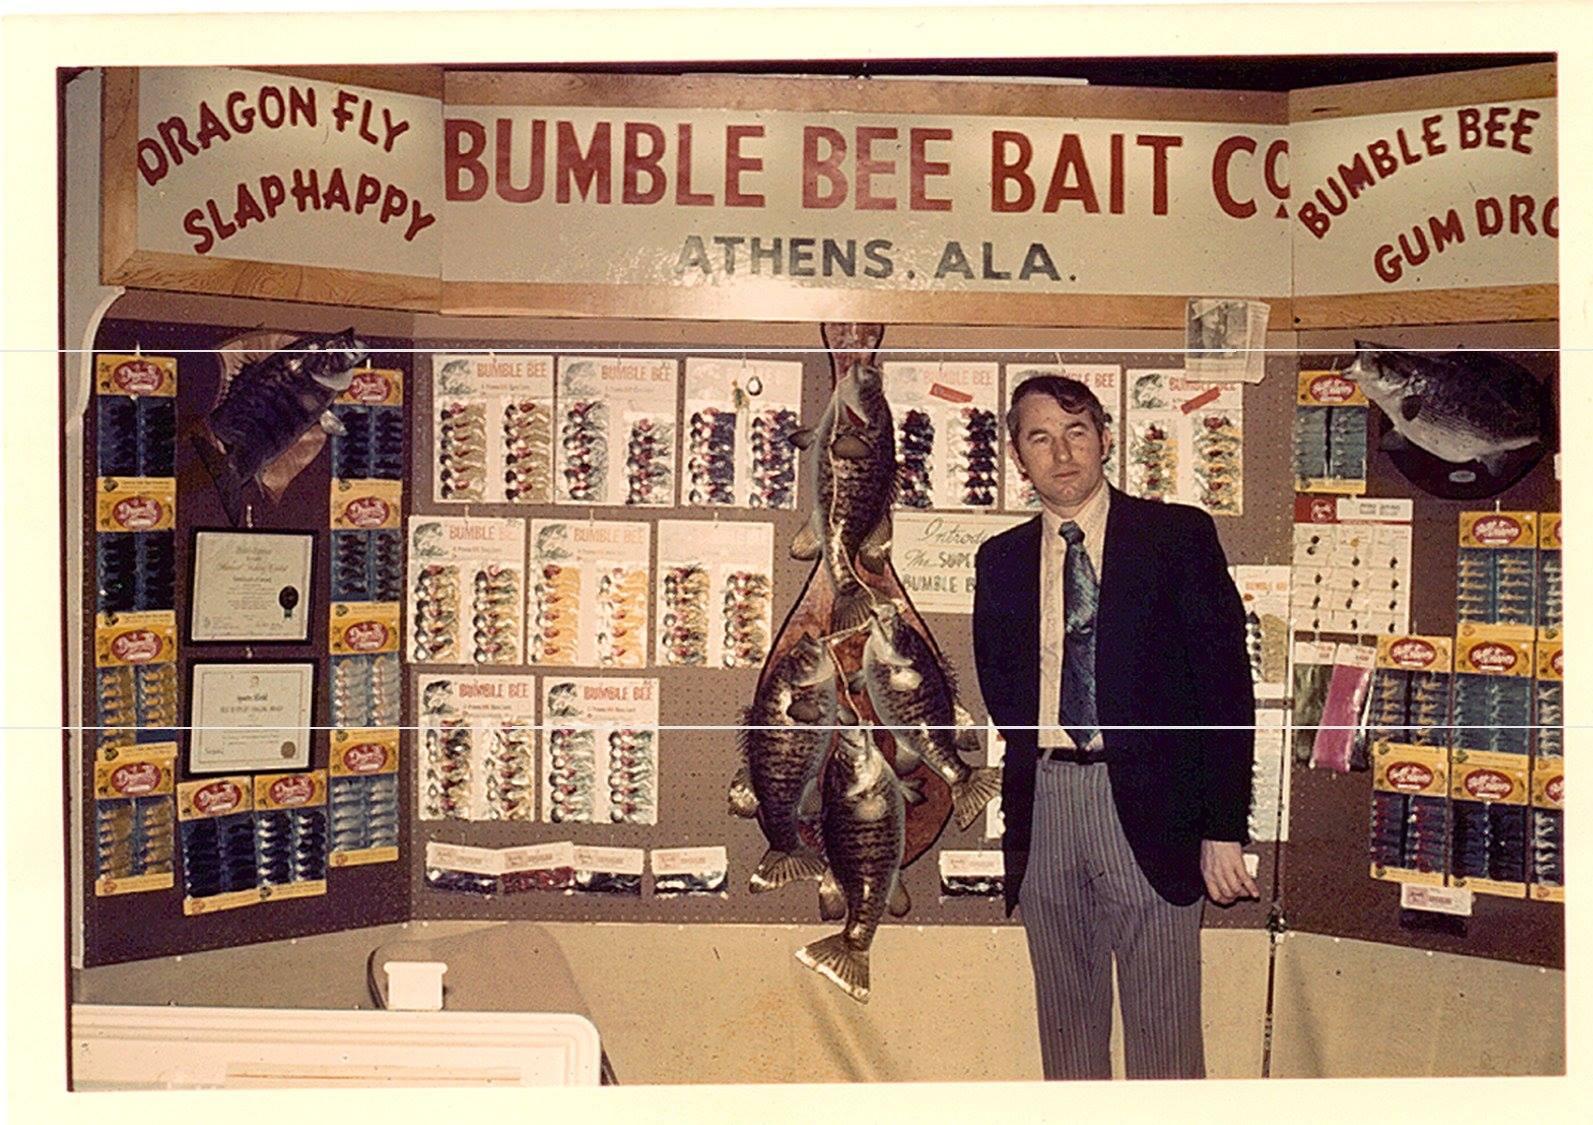 1974 Bill Huntley bumble bee baits tackle show